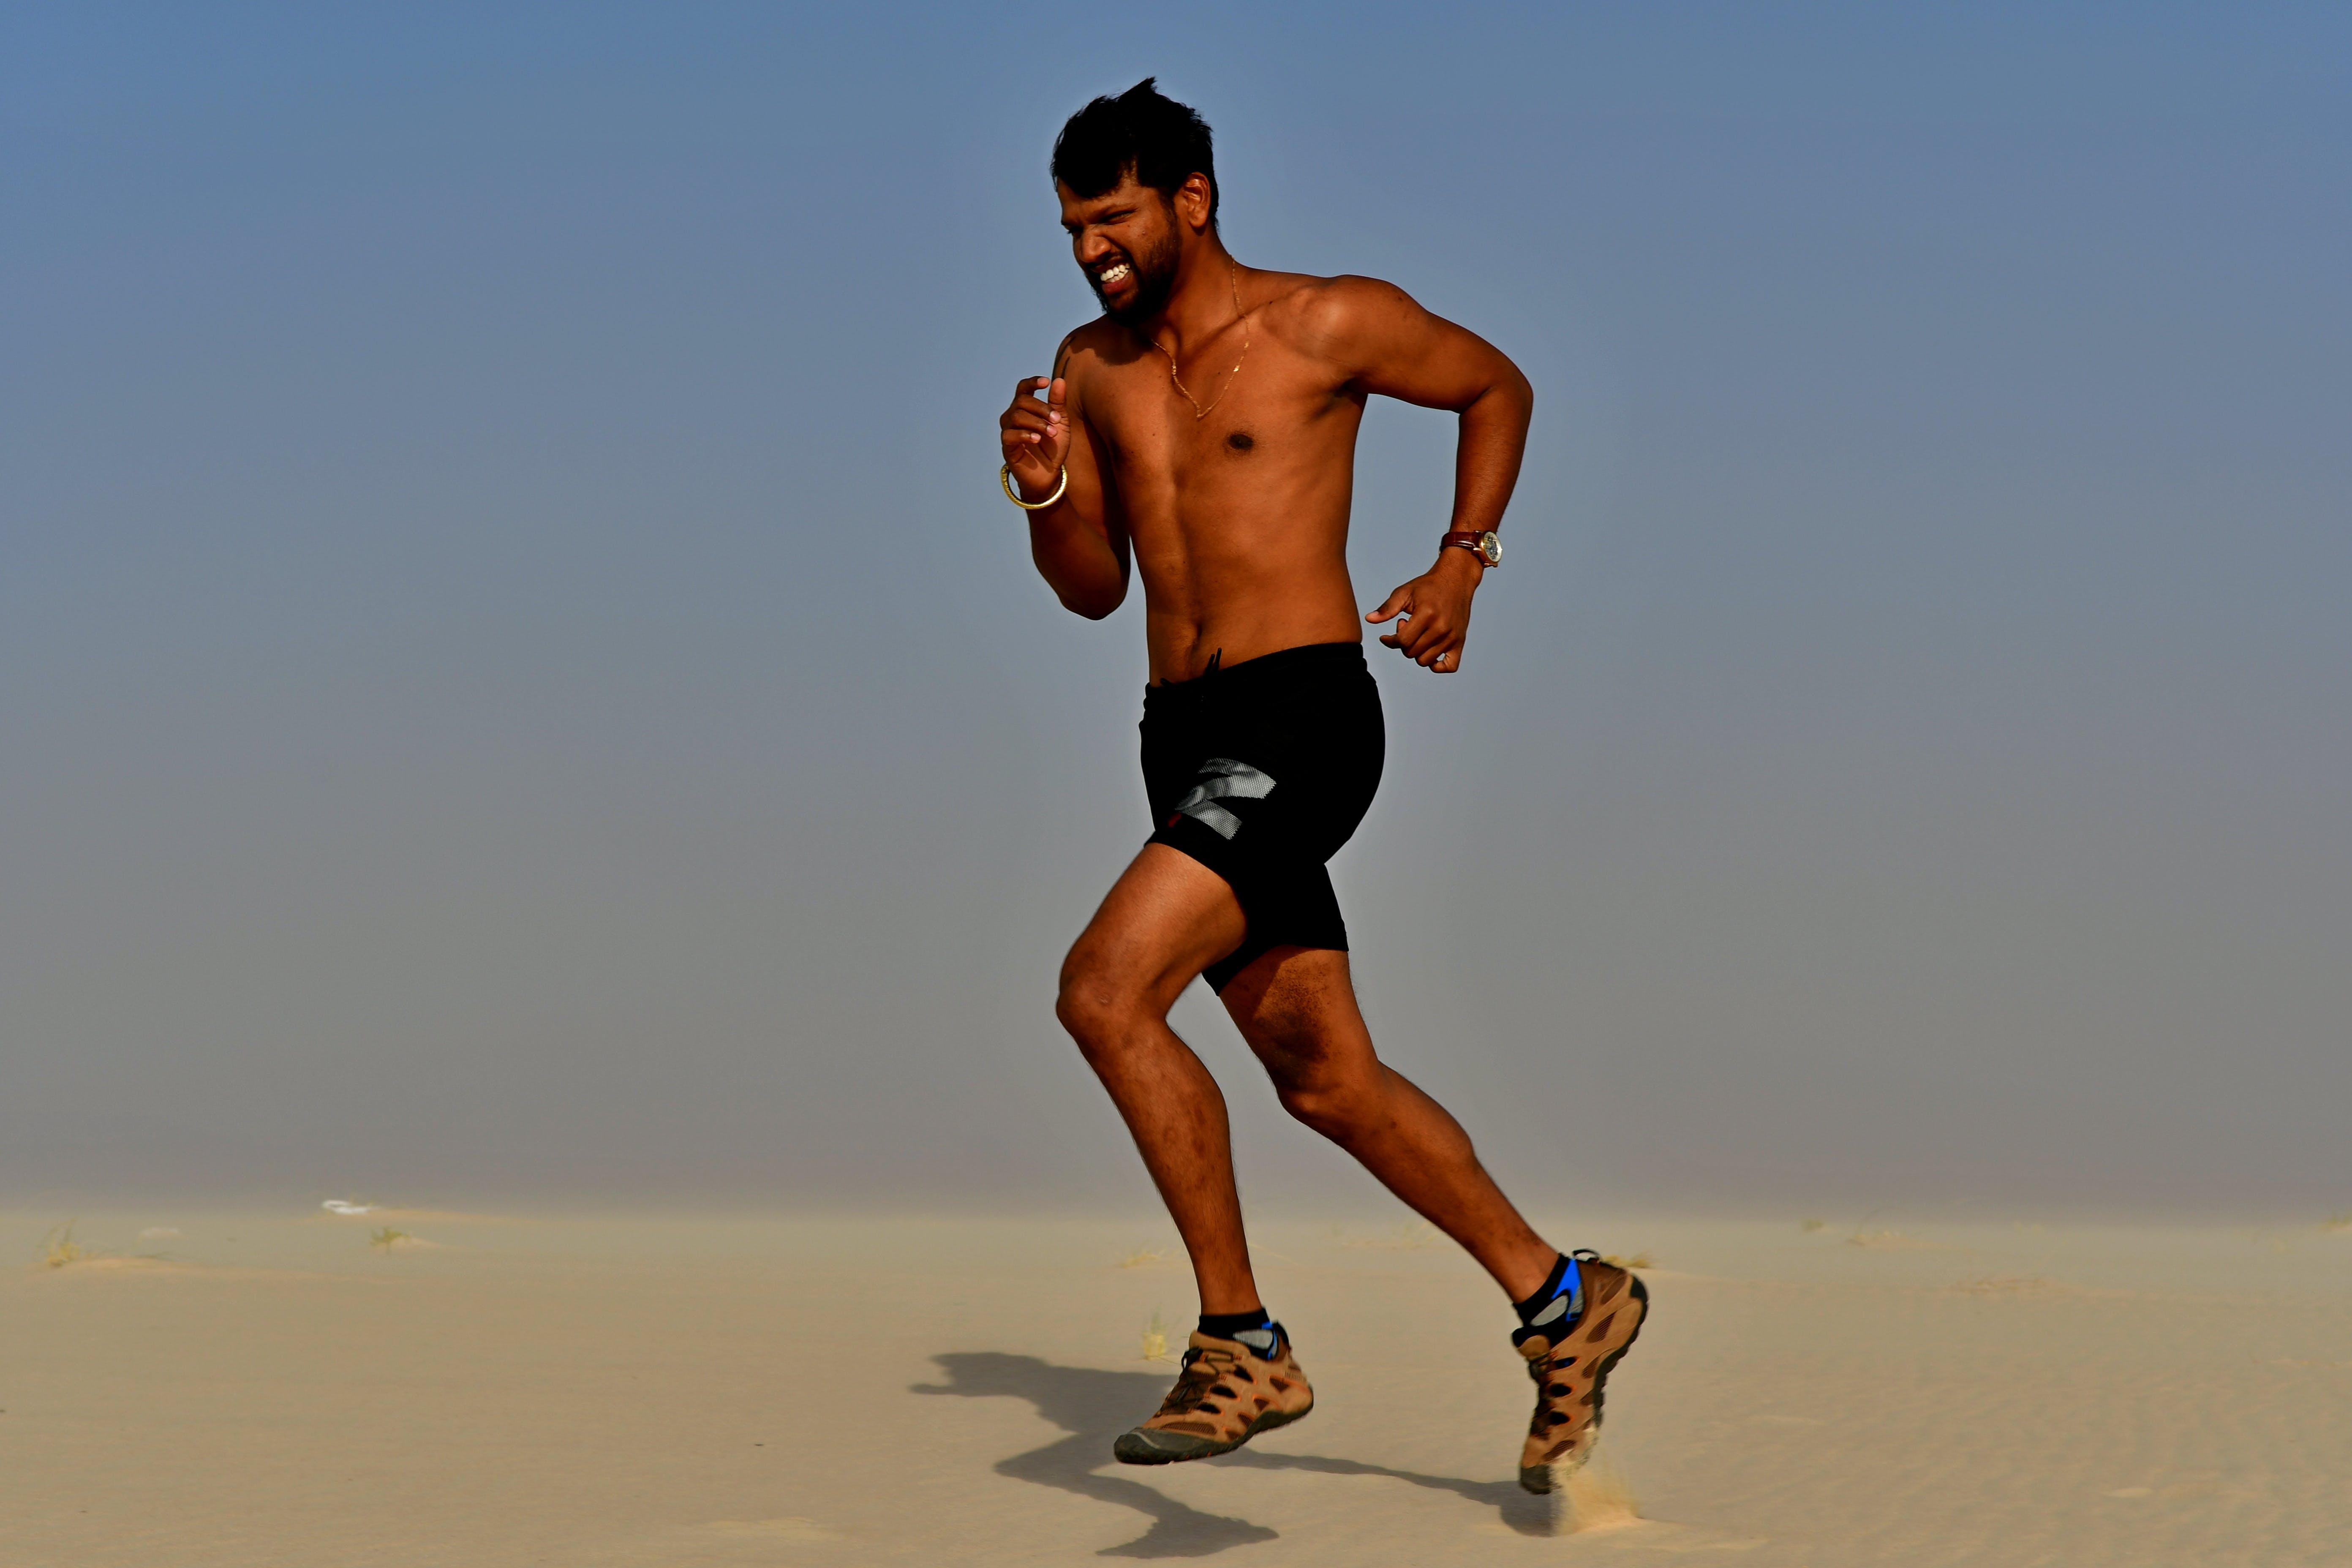 Free stock photo of jogging, fitness, athlete, runner